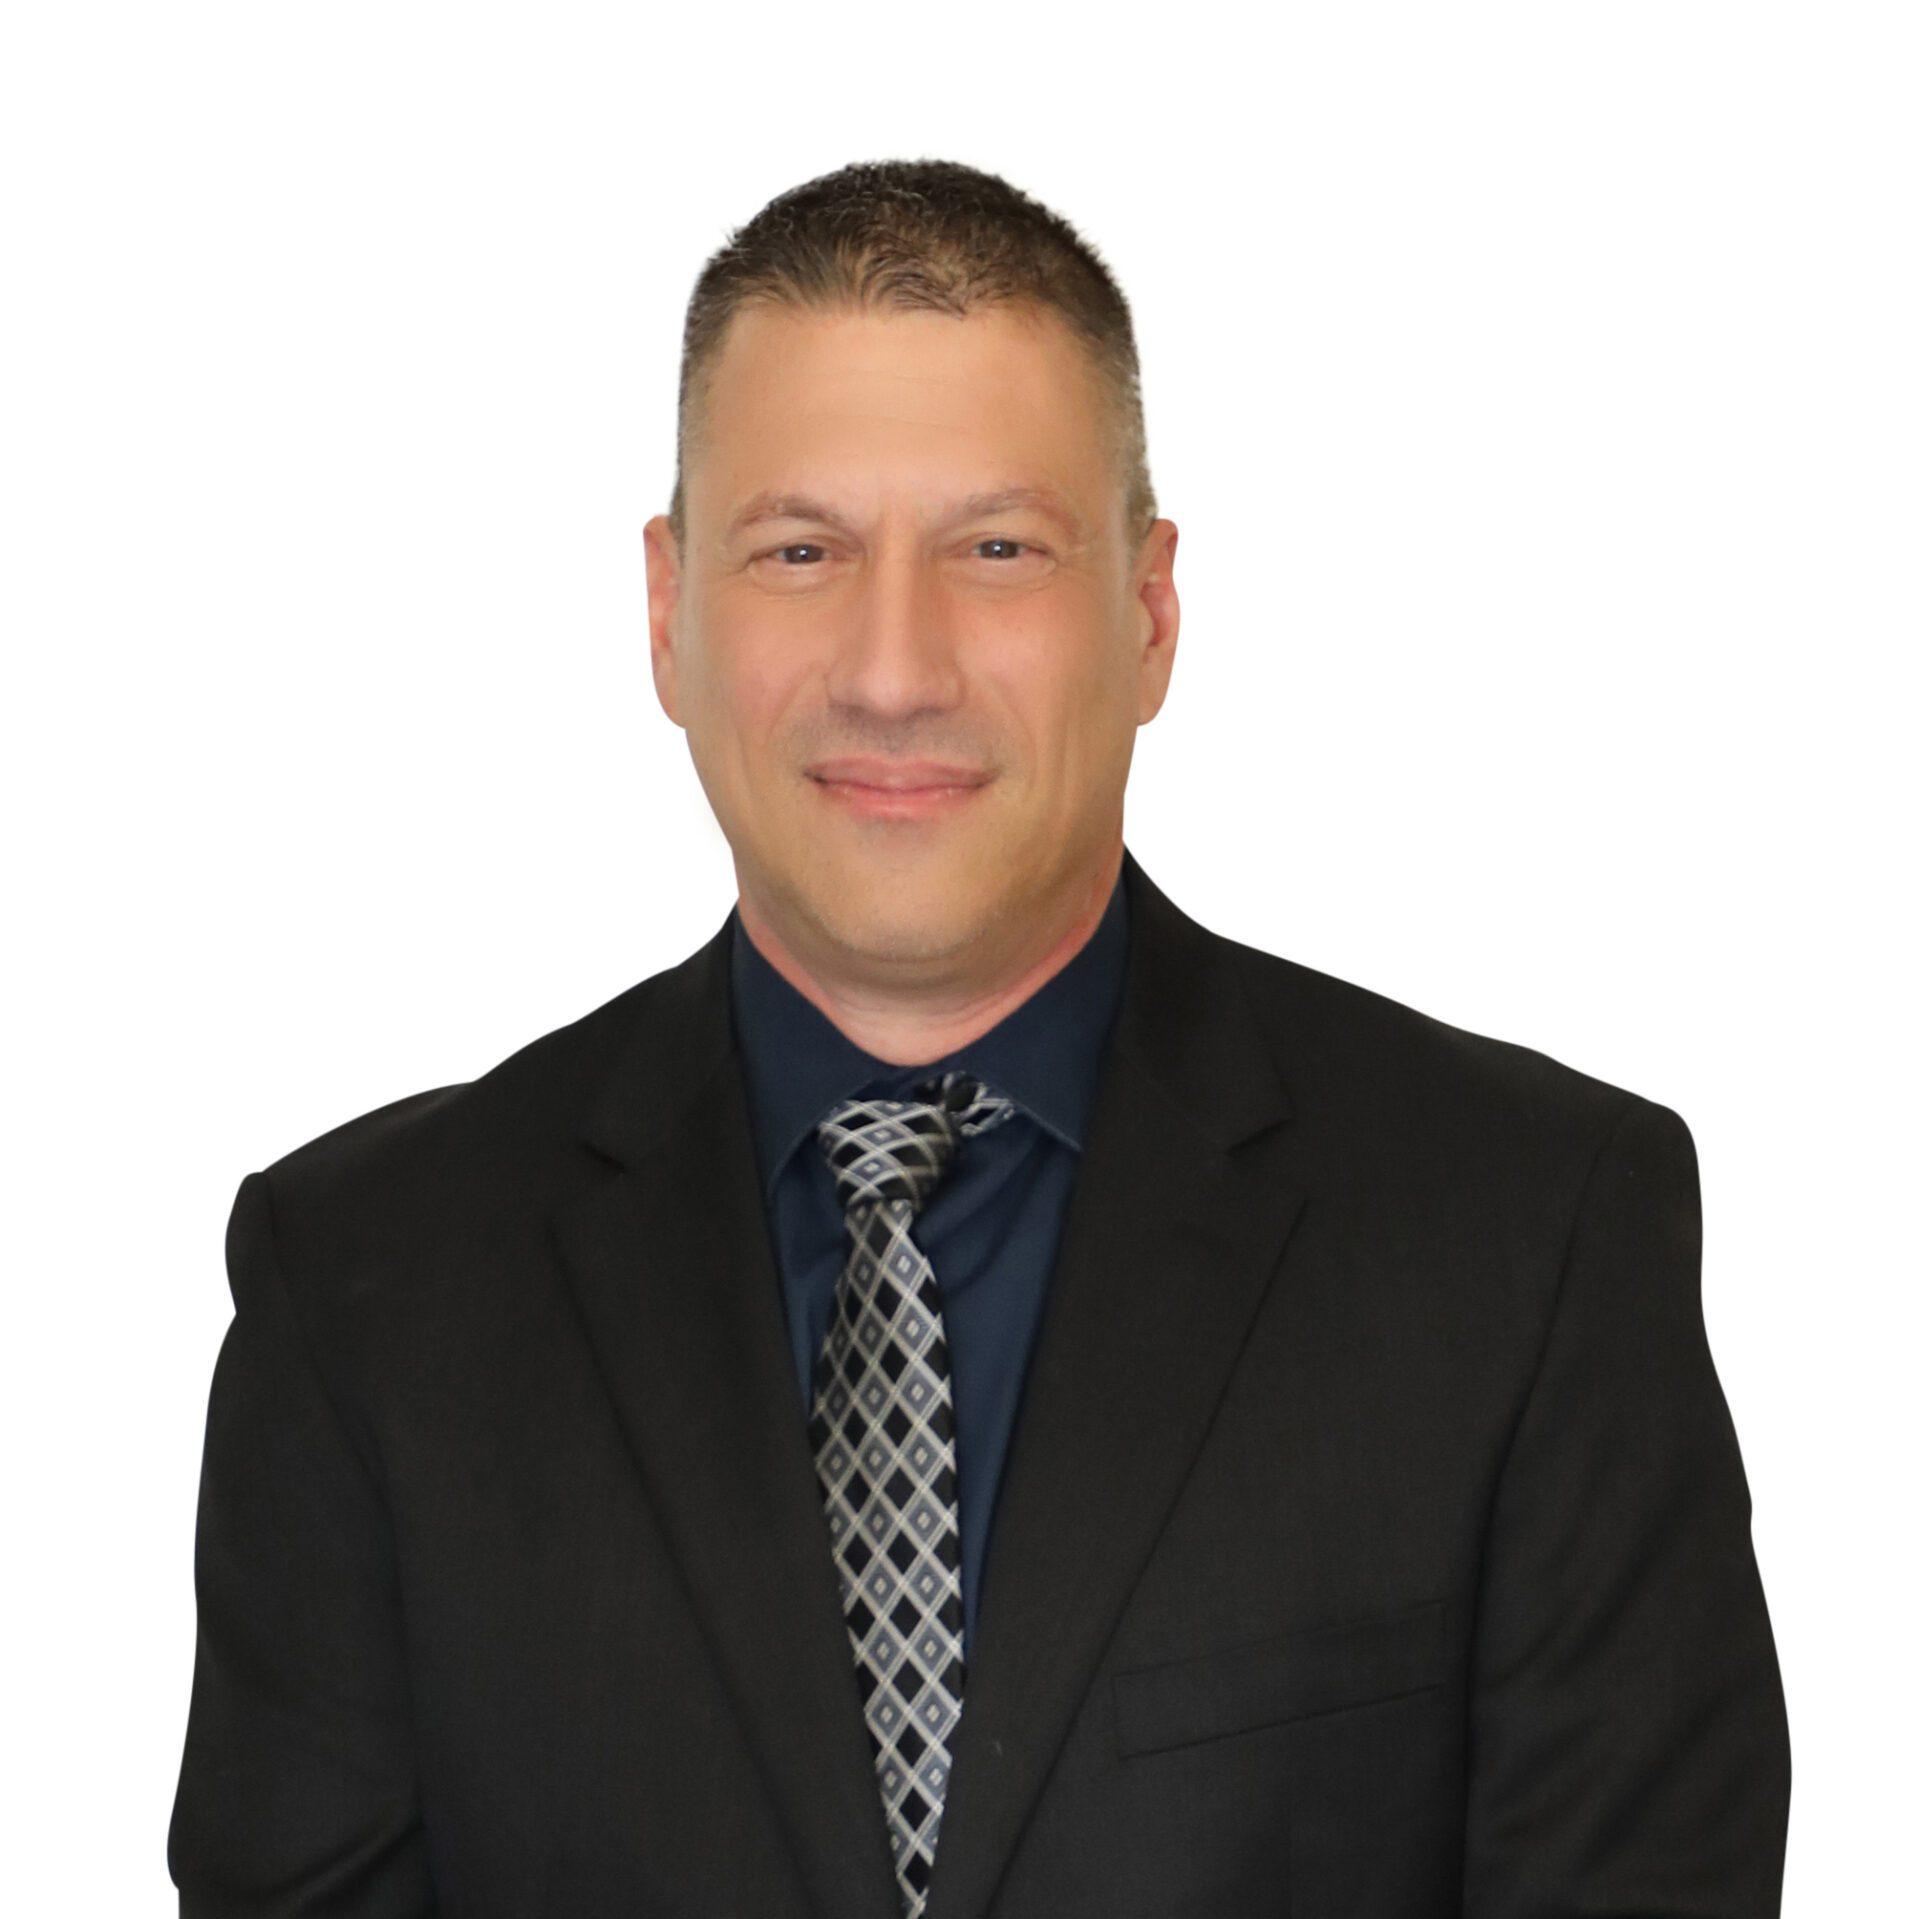 Bill Schalik, Profile Photo